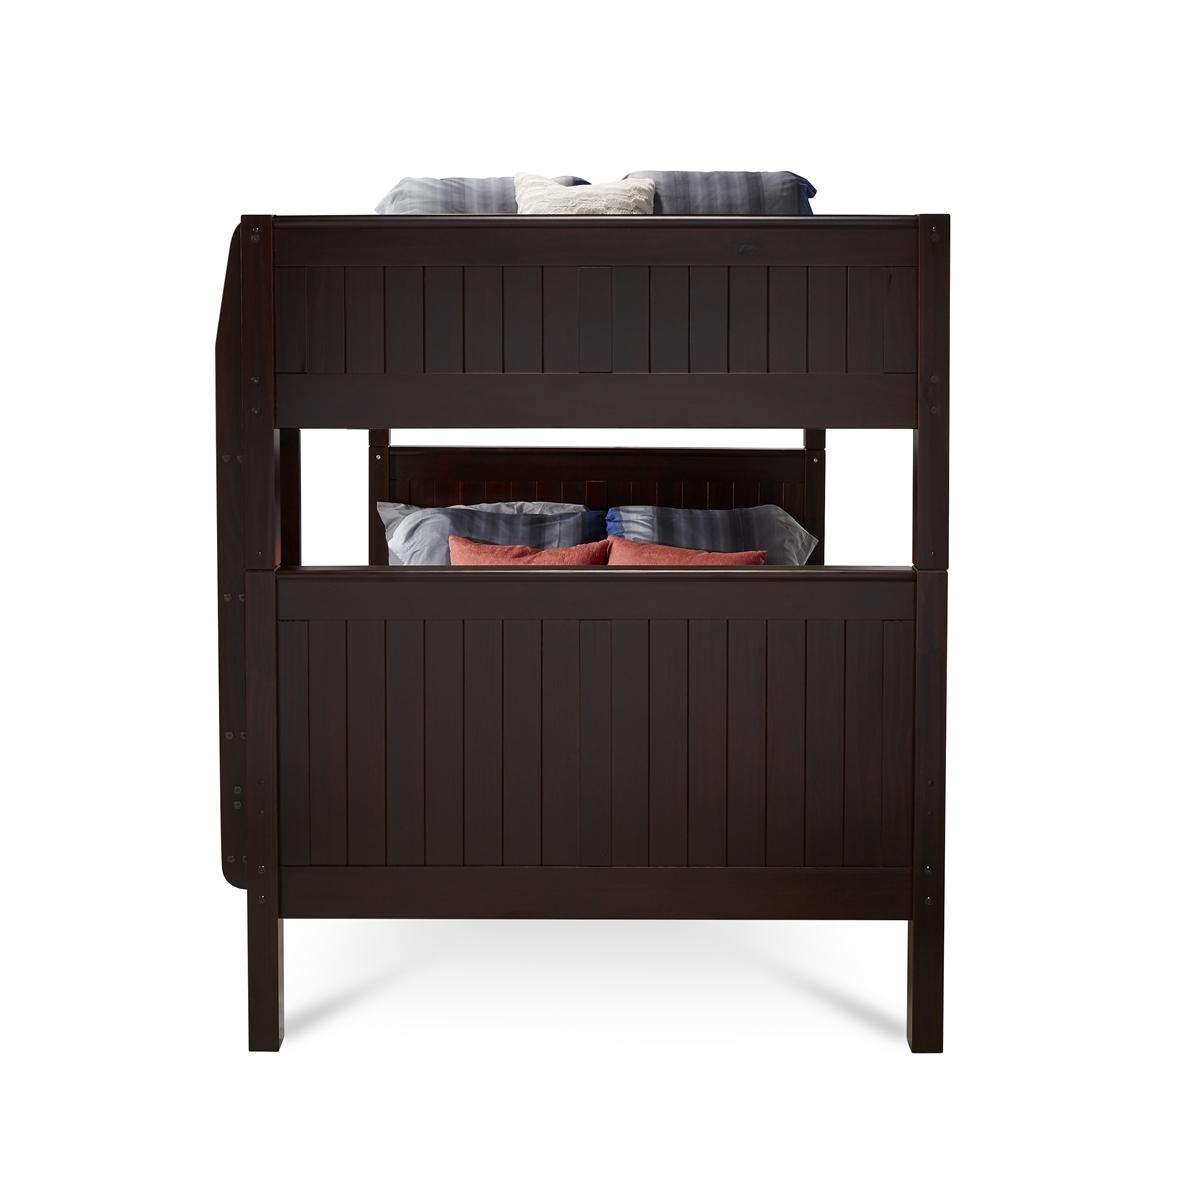 Camaflexi Full Over Full Bunk Bed Panel Headboard Cappuccino Finish